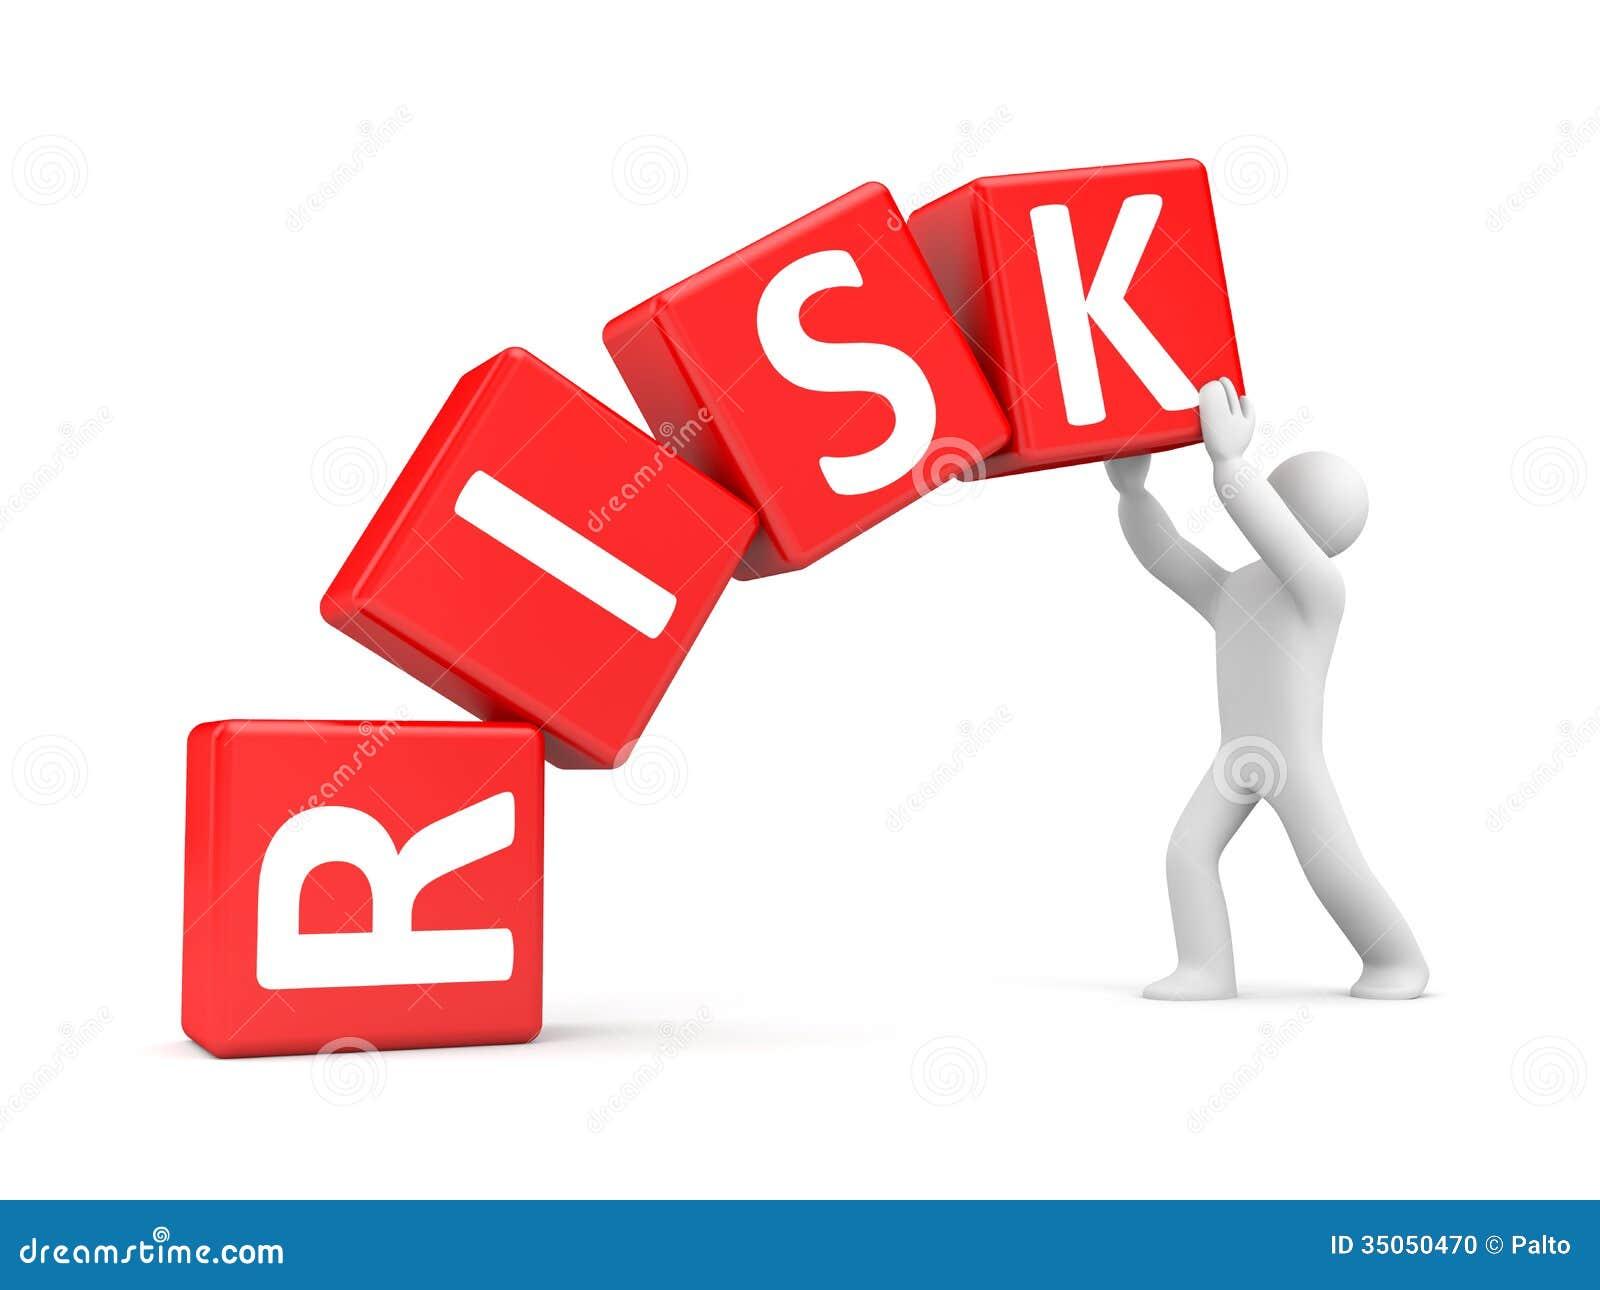 Schutzkittel High Risk zum Binden | Franz Mensch